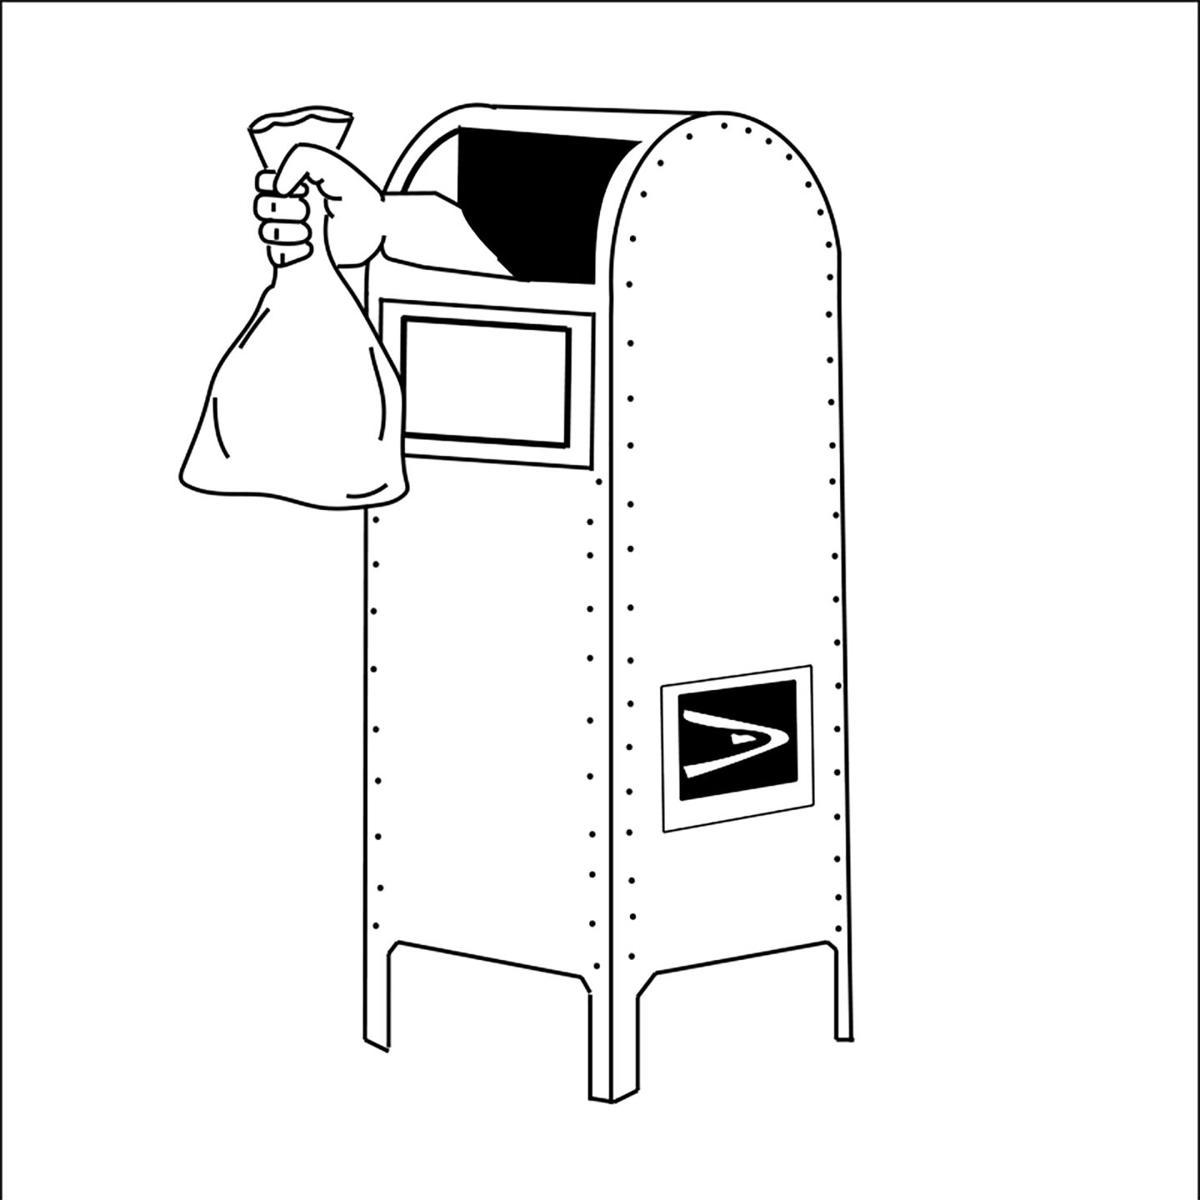 mailbox for blotter 8-26